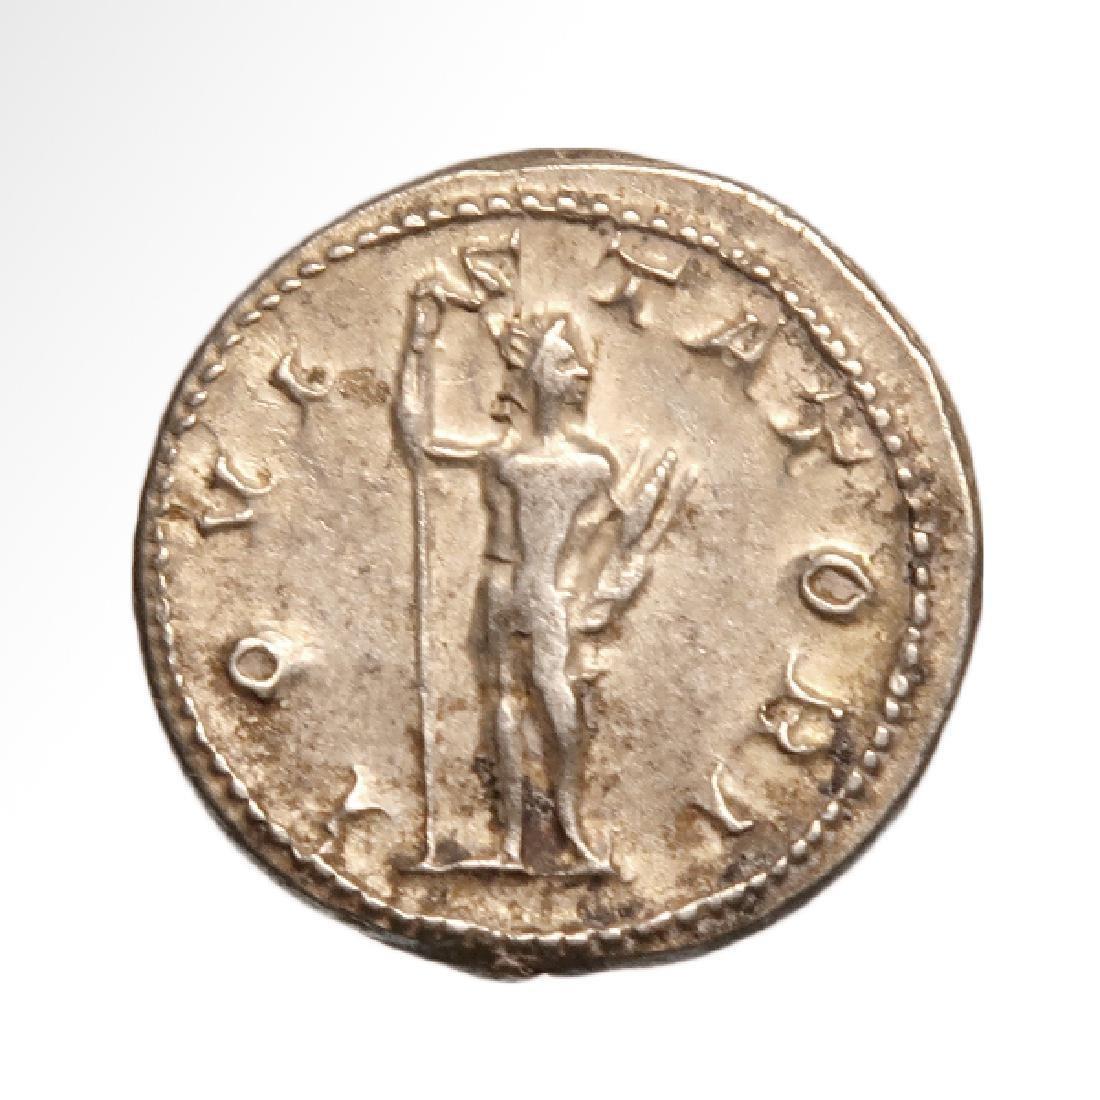 Emperor Gordianus III Coin, Struck A.D. 240-244, Rome - 2